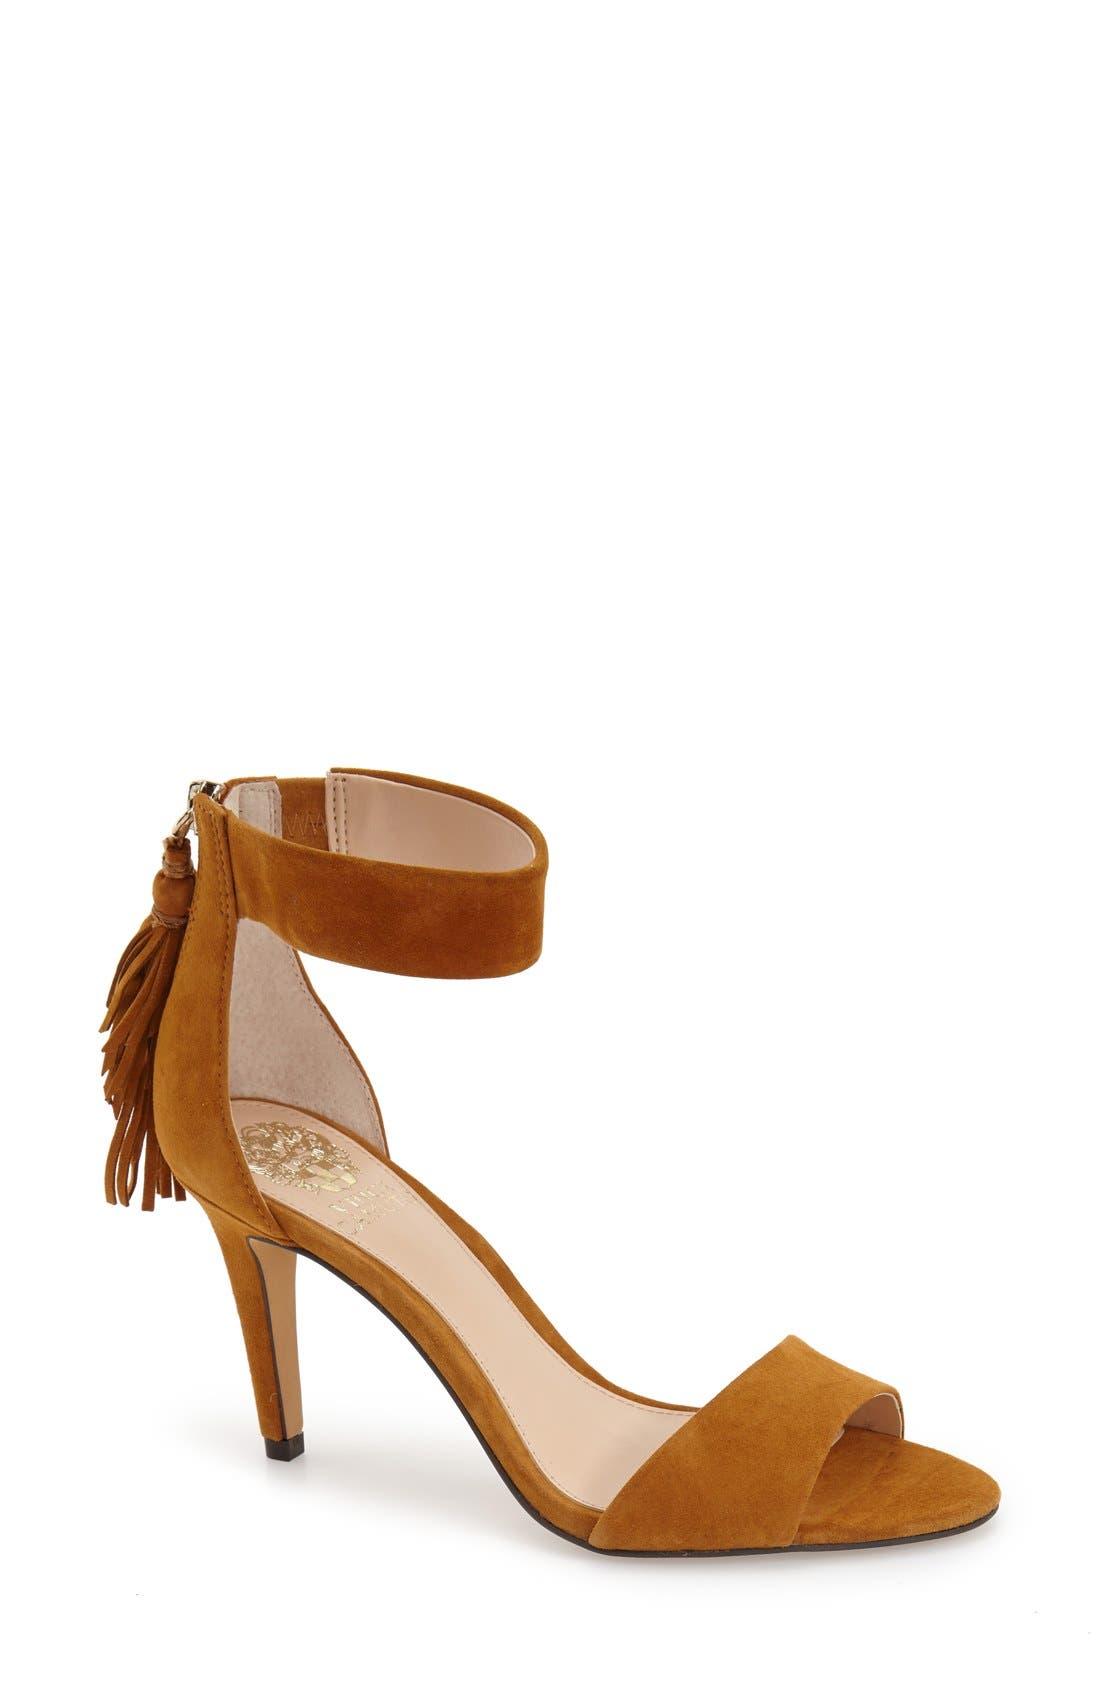 Alternate Image 1 Selected - Vince Camuto 'Catalyn' Sandal (Women)